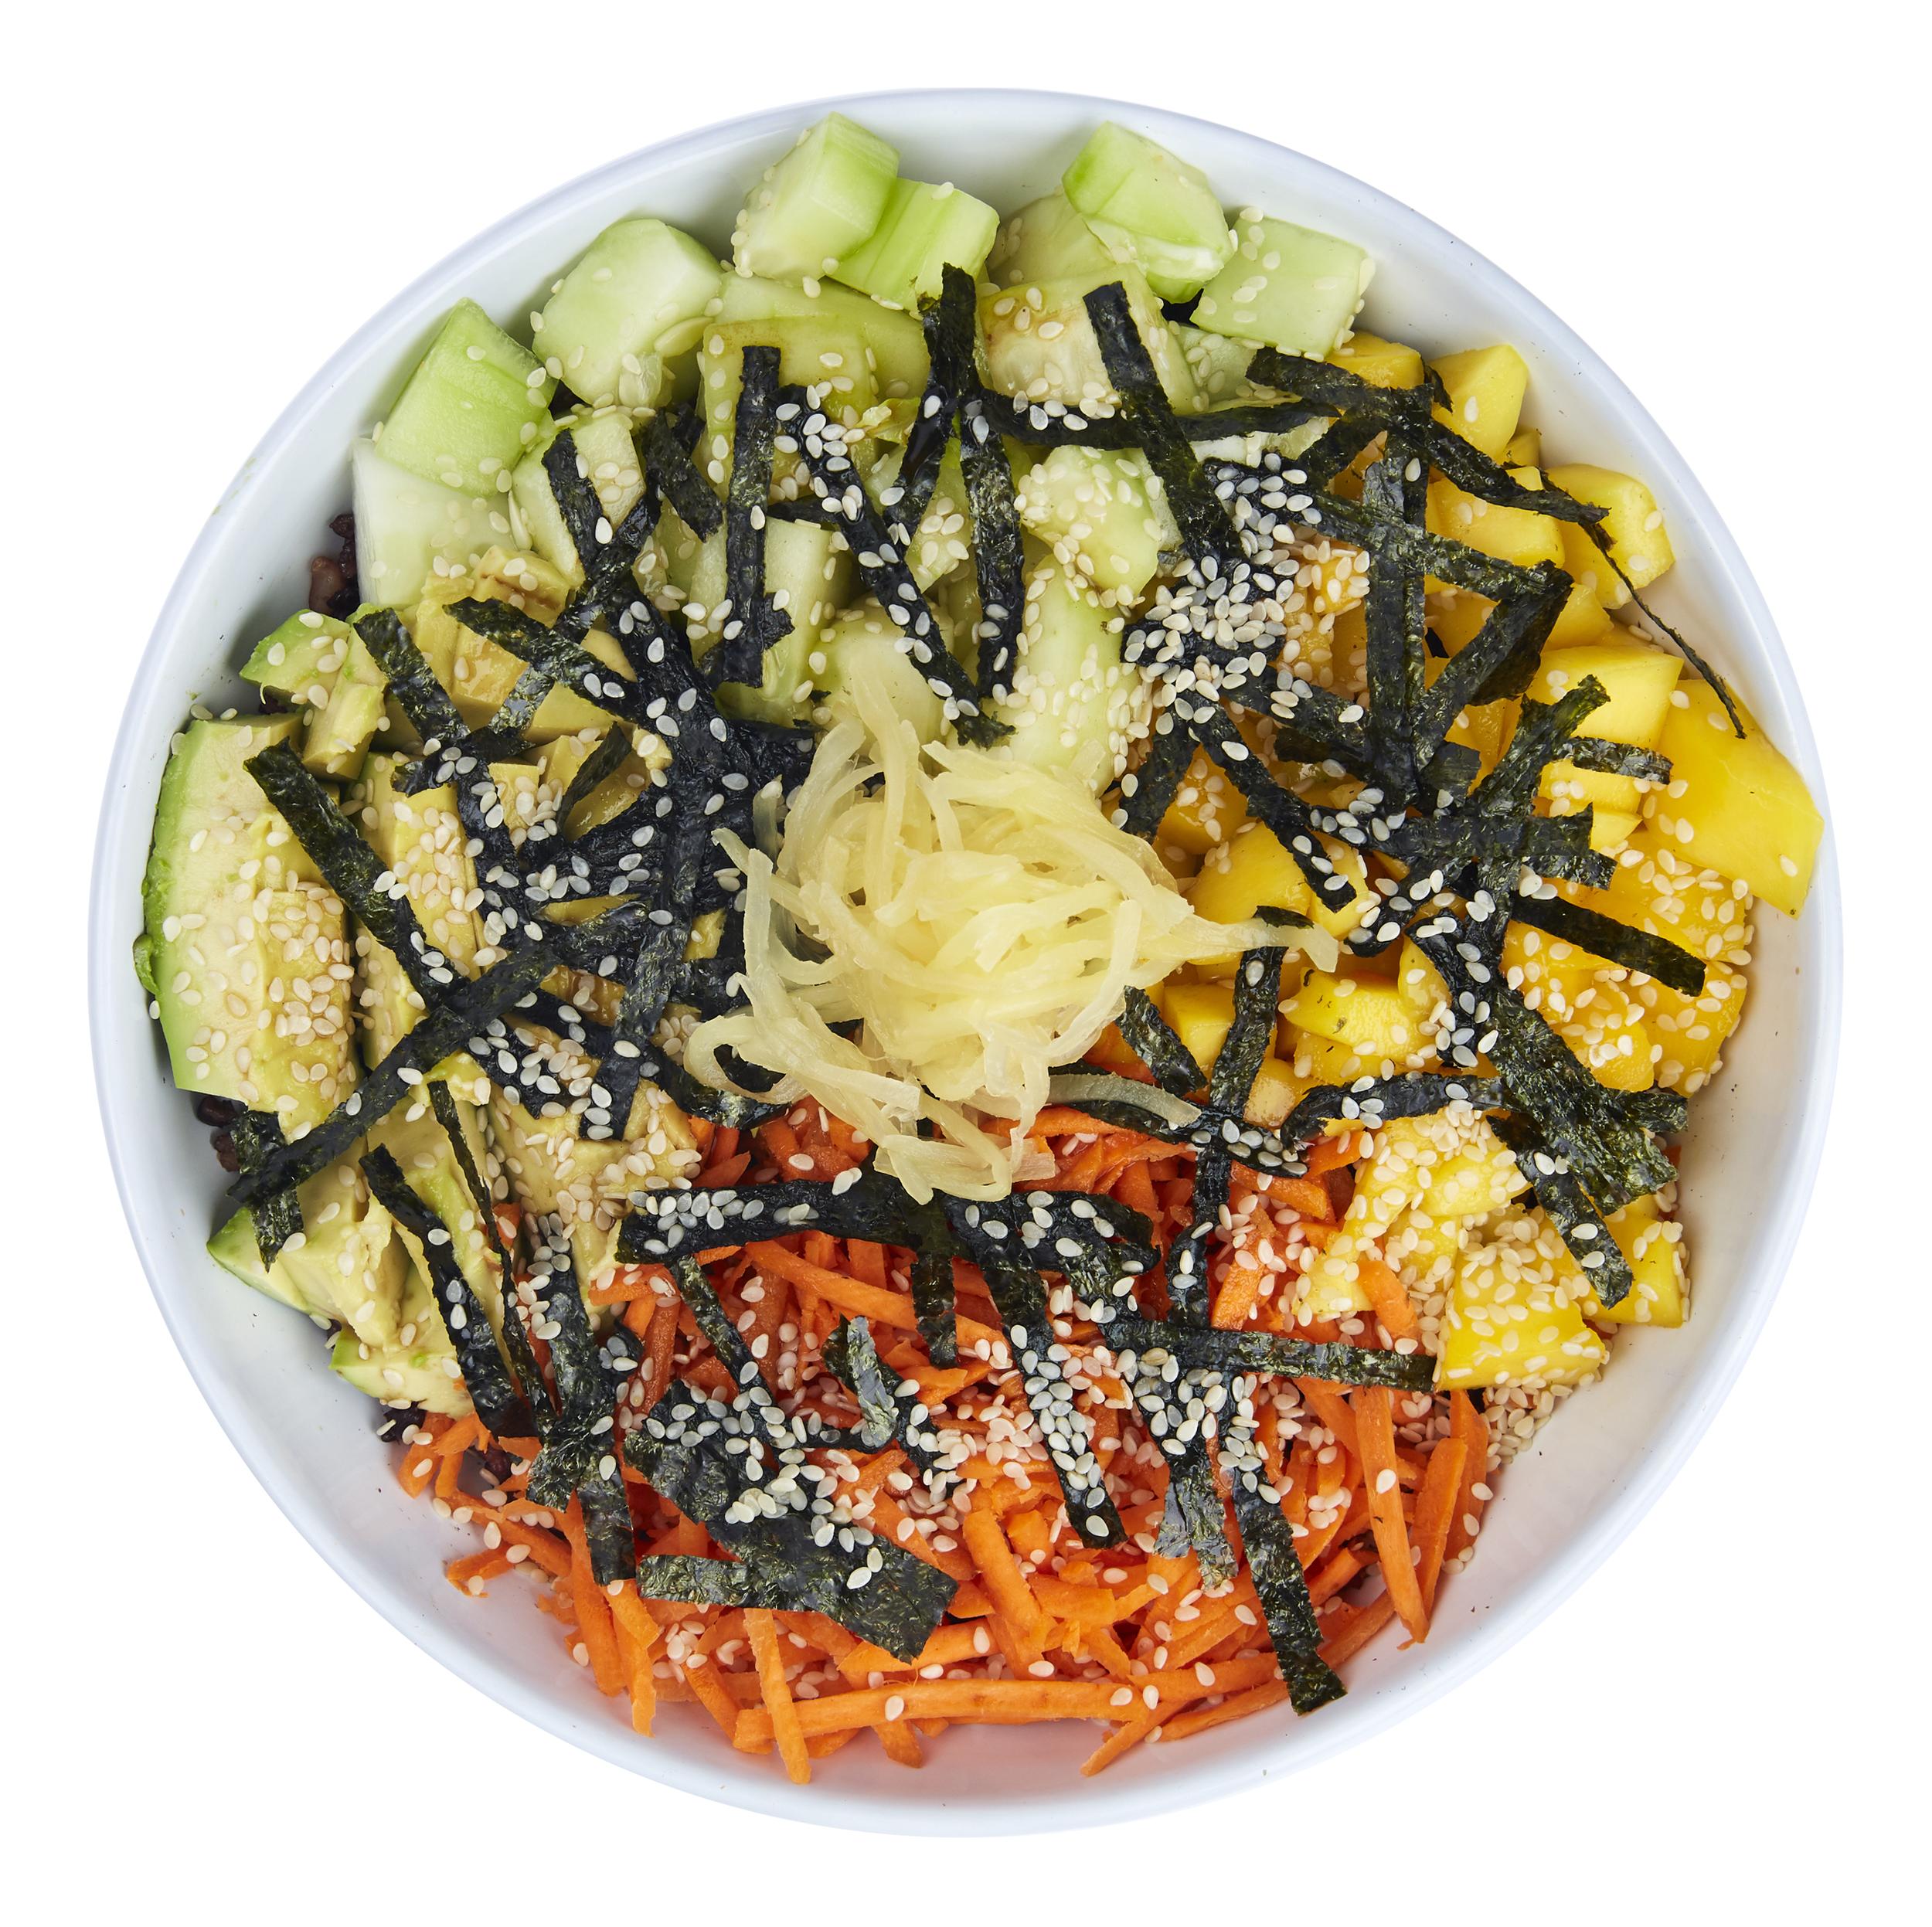 Vegan Sushi Bowl  - $10.50  Rice blend, avocado, mango, cucumbers, carrots, nori strips, ginger, coconut amino sauce